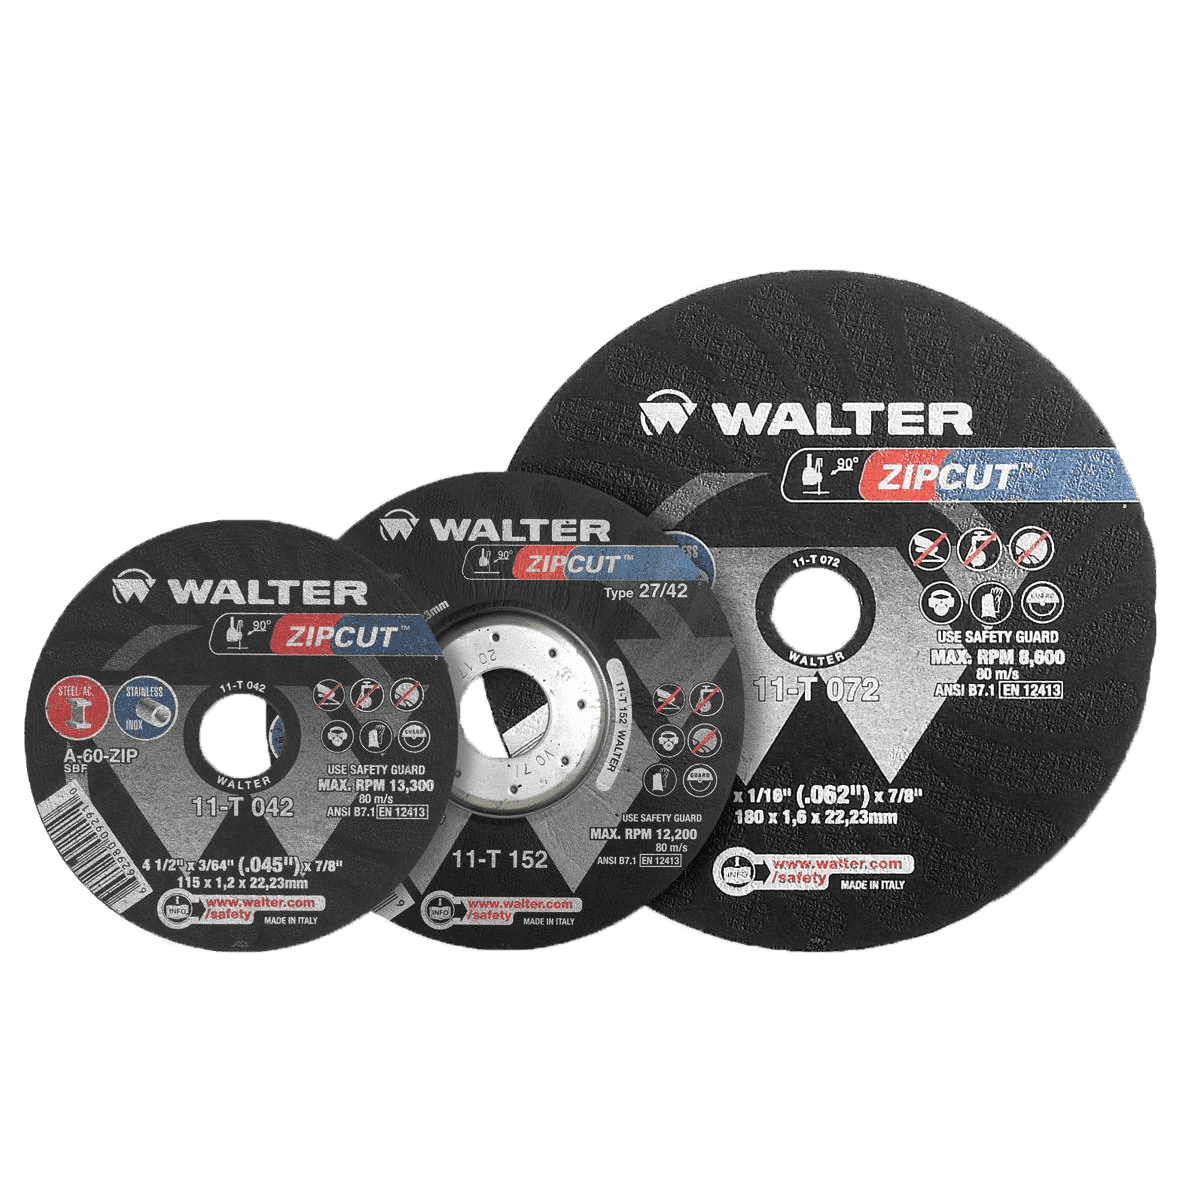 Walter ZIPCUT™ Cut-off Wheels